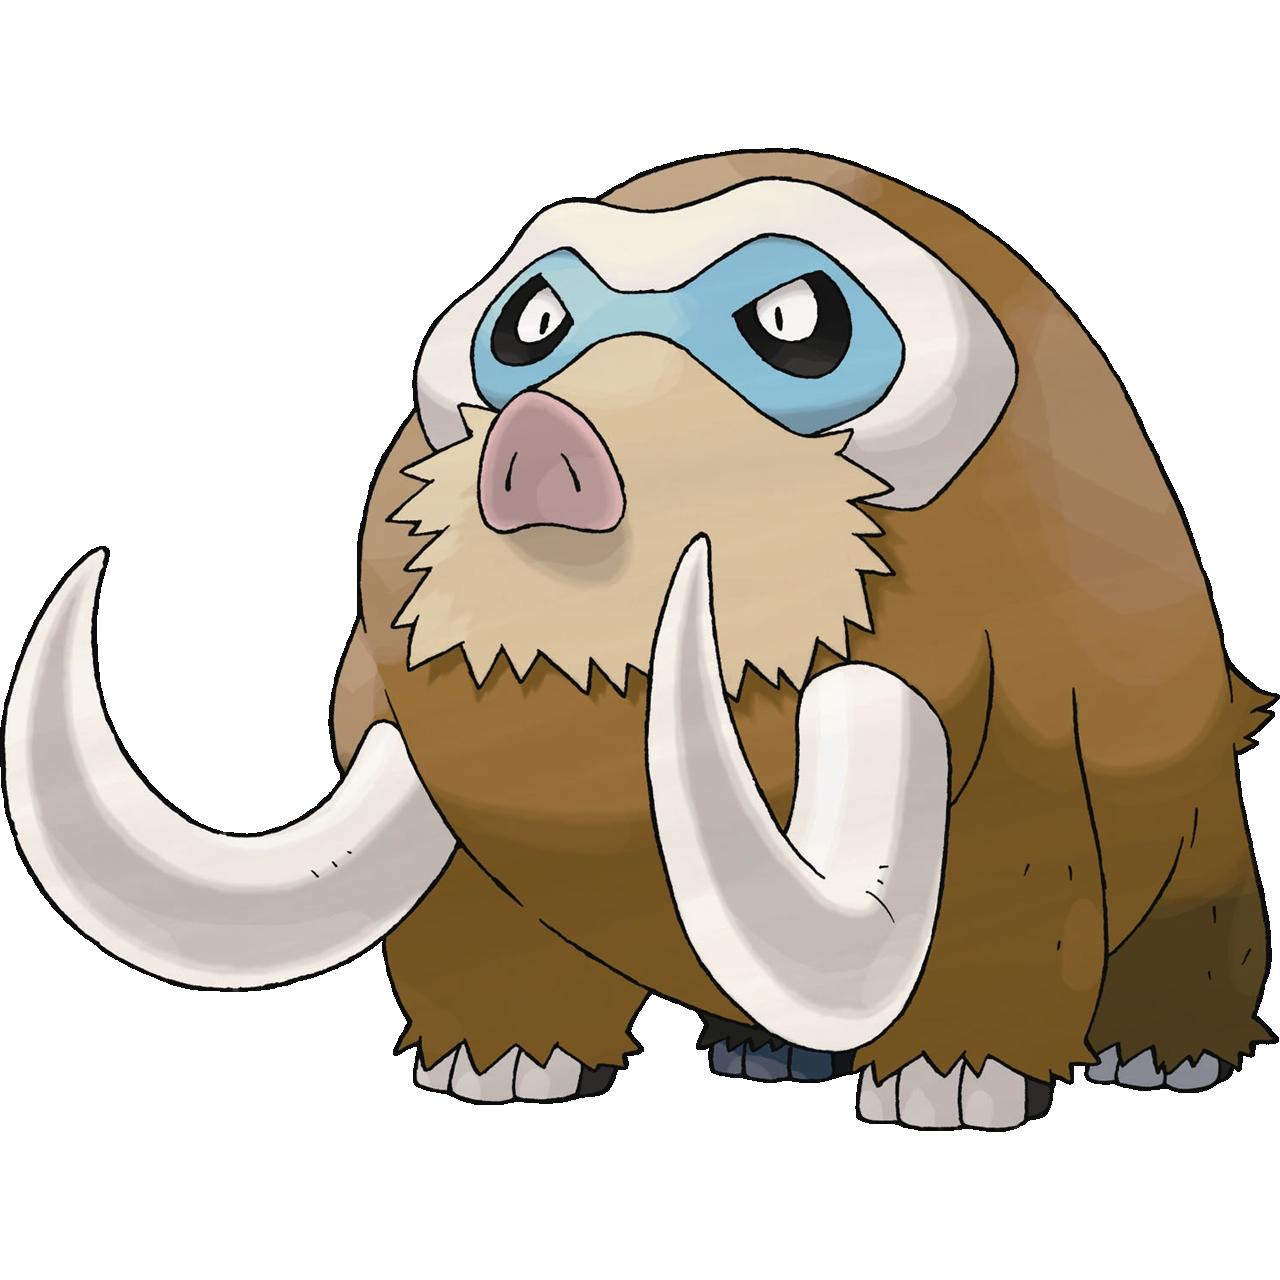 Mamoswine   Pokemon GO Wiki - GamePress